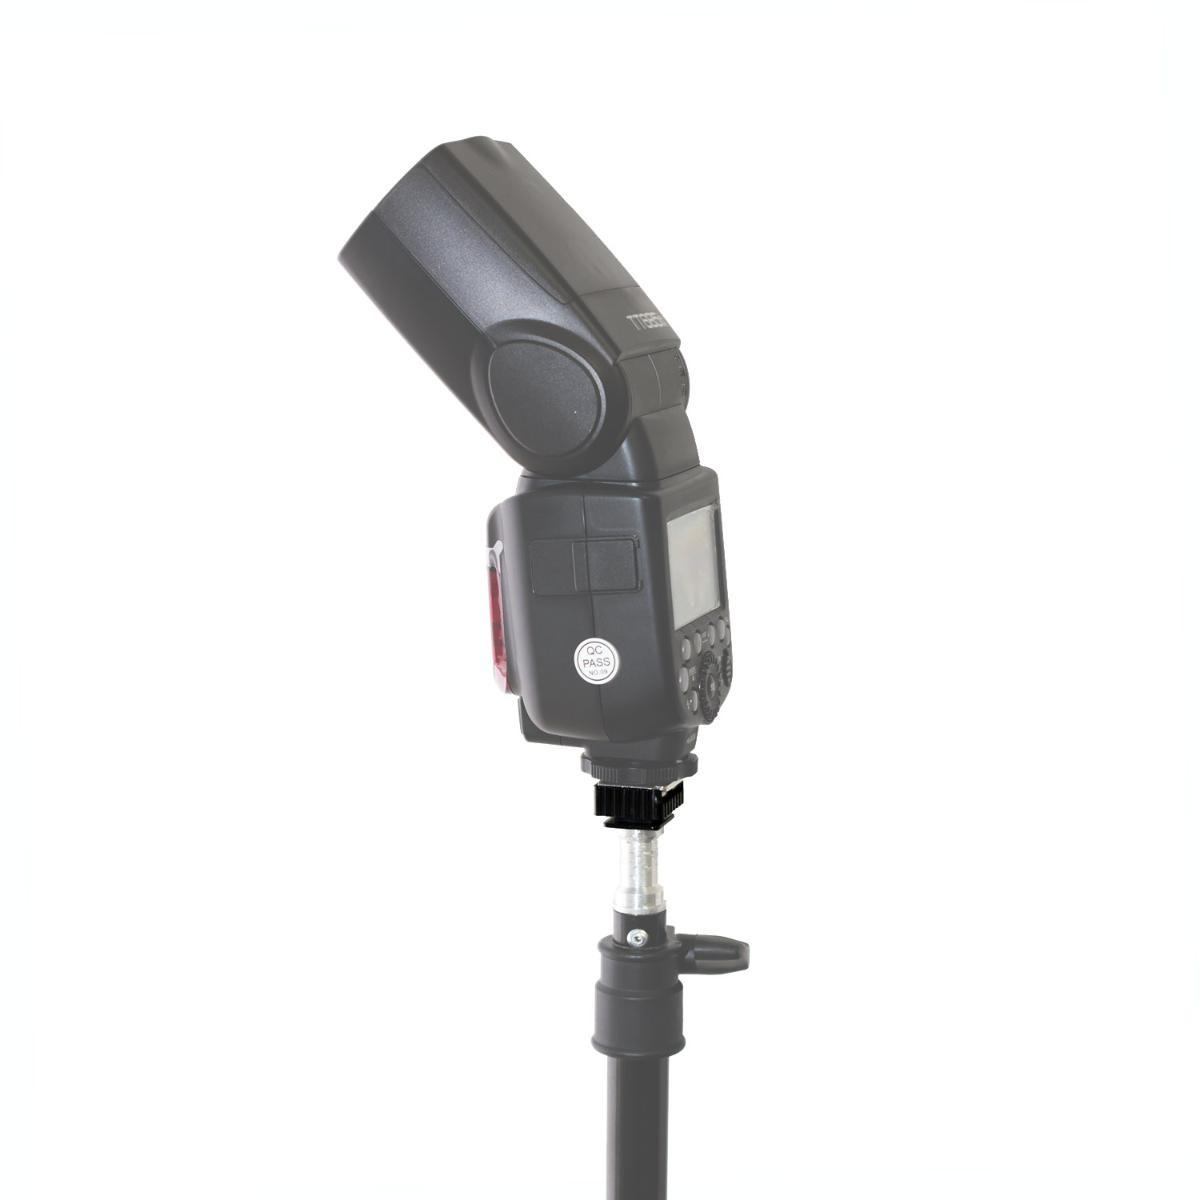 Adaptador Sapata Hot Shoe YA5004 para Flashes e Equipamentos Fotográficos  - Fotolux